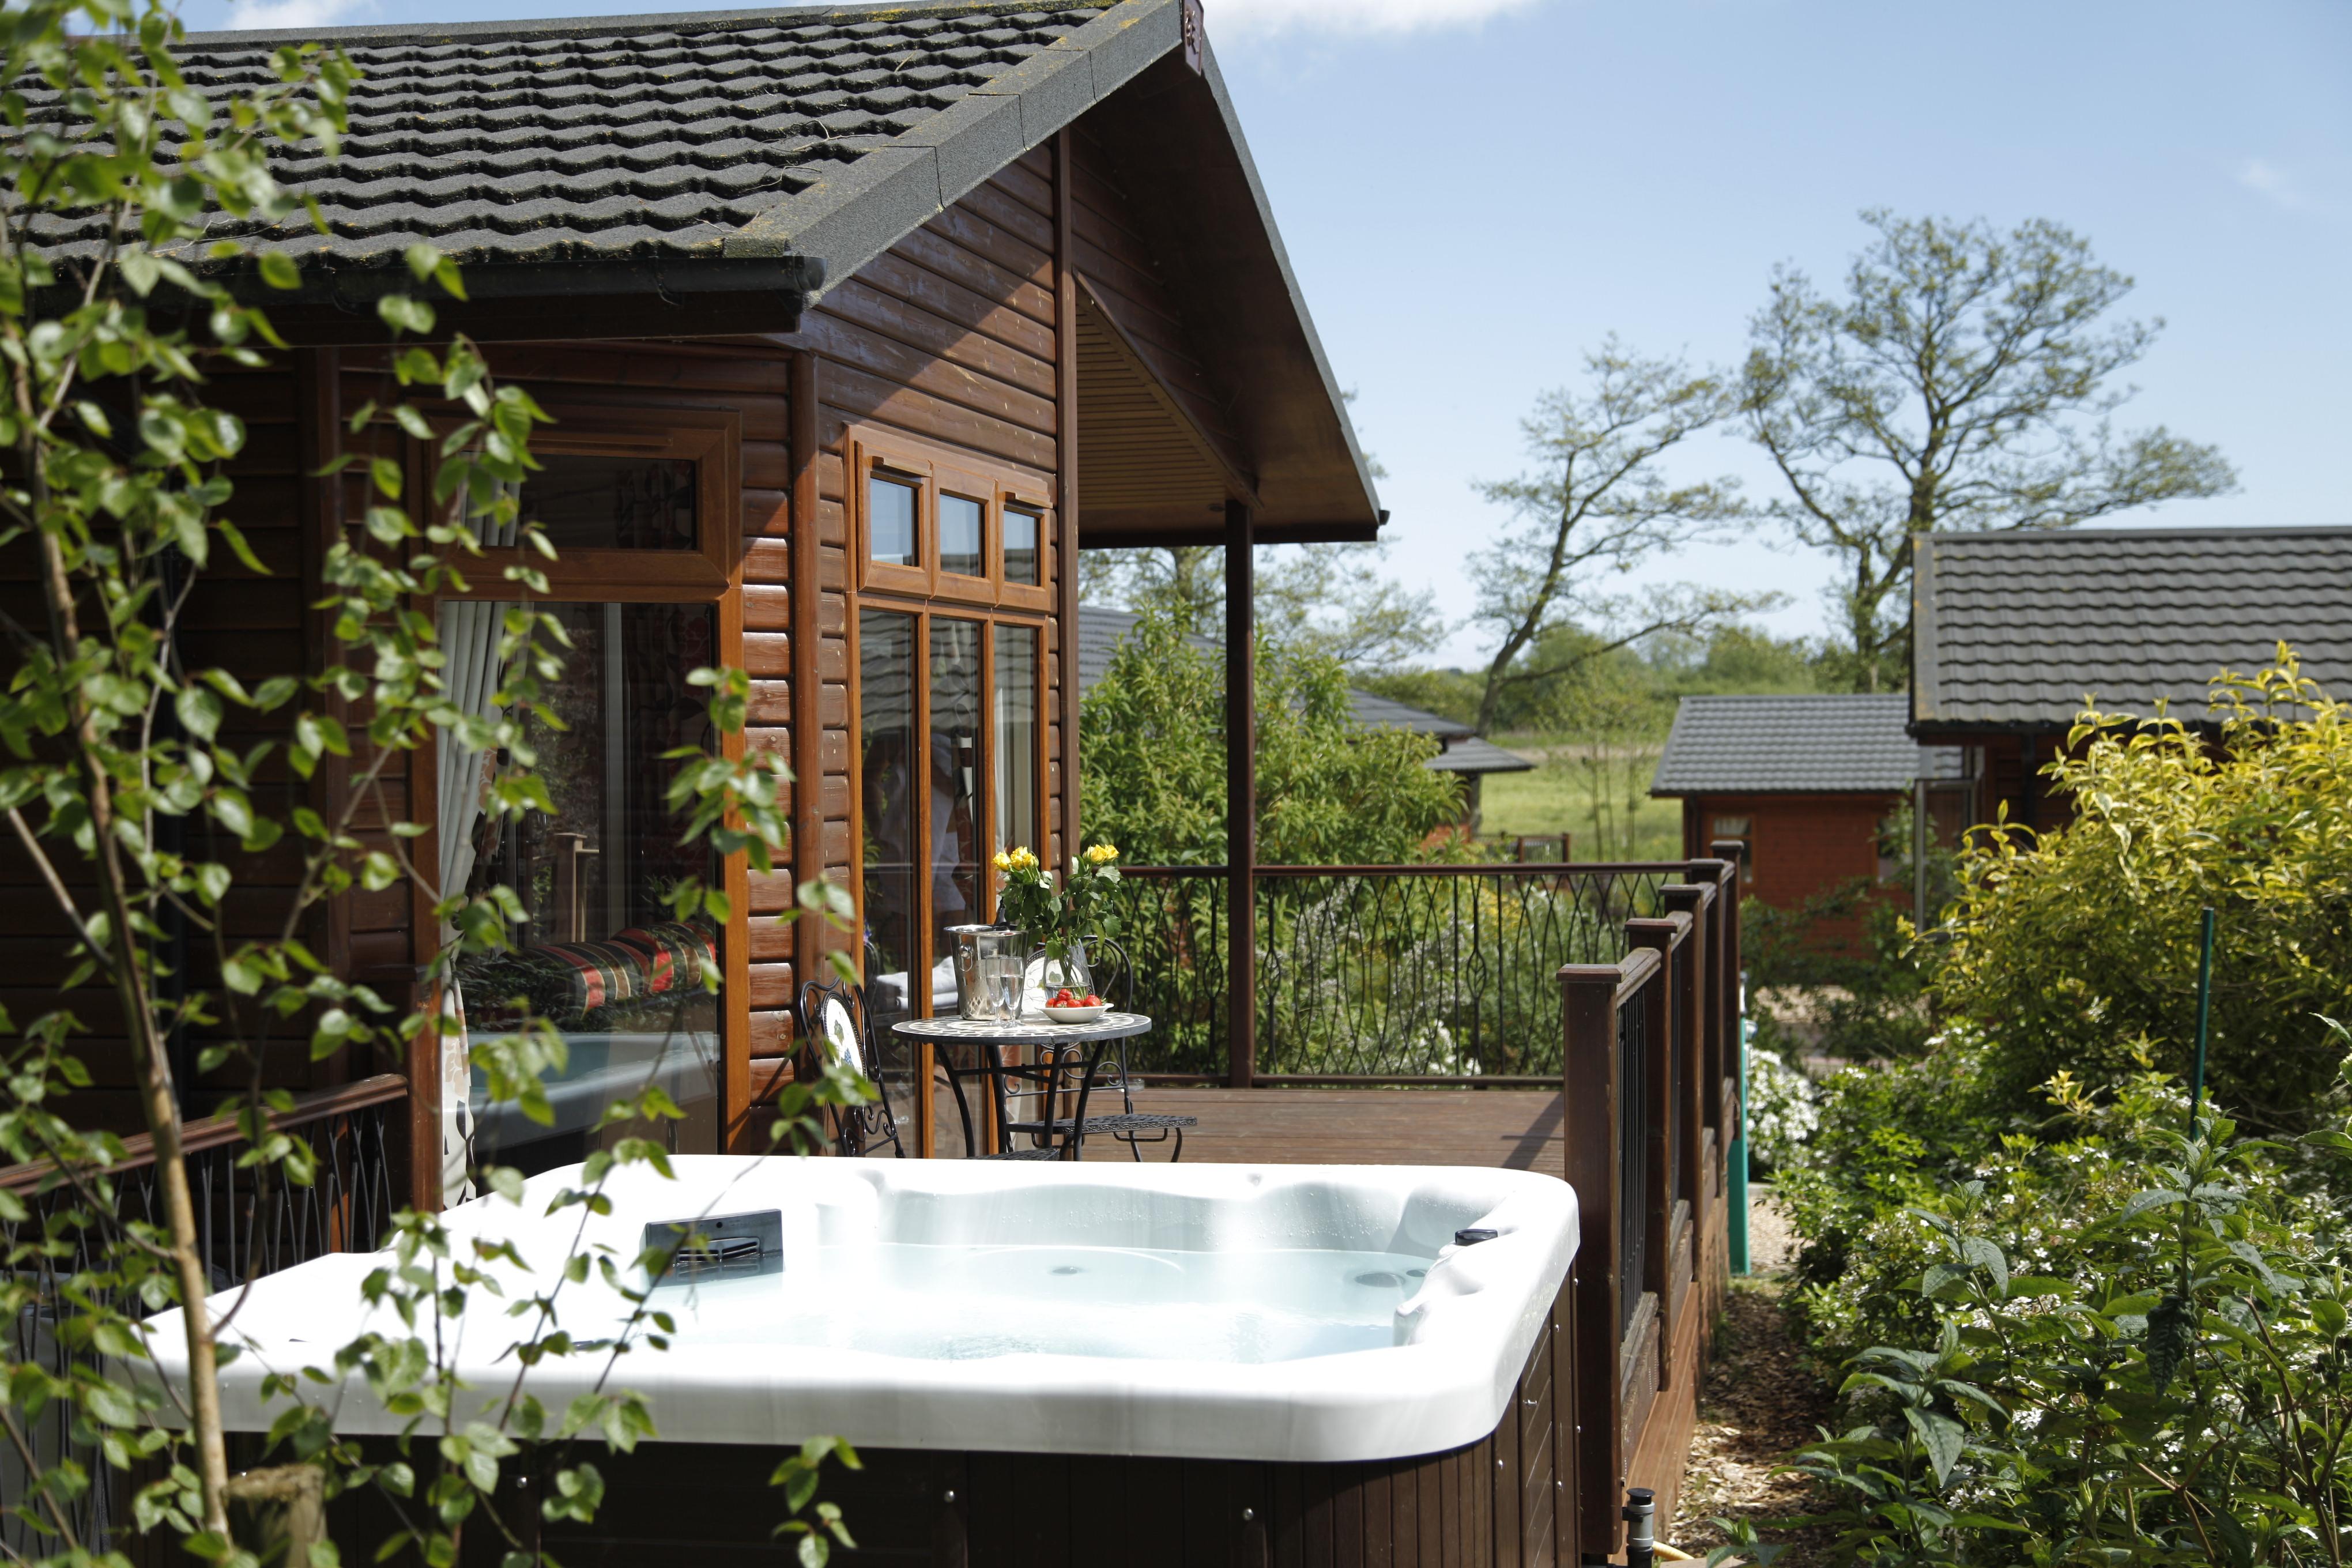 Full Bedroom Set Broad View Holiday Lodge Waterside Breaks Blog Amp Latest